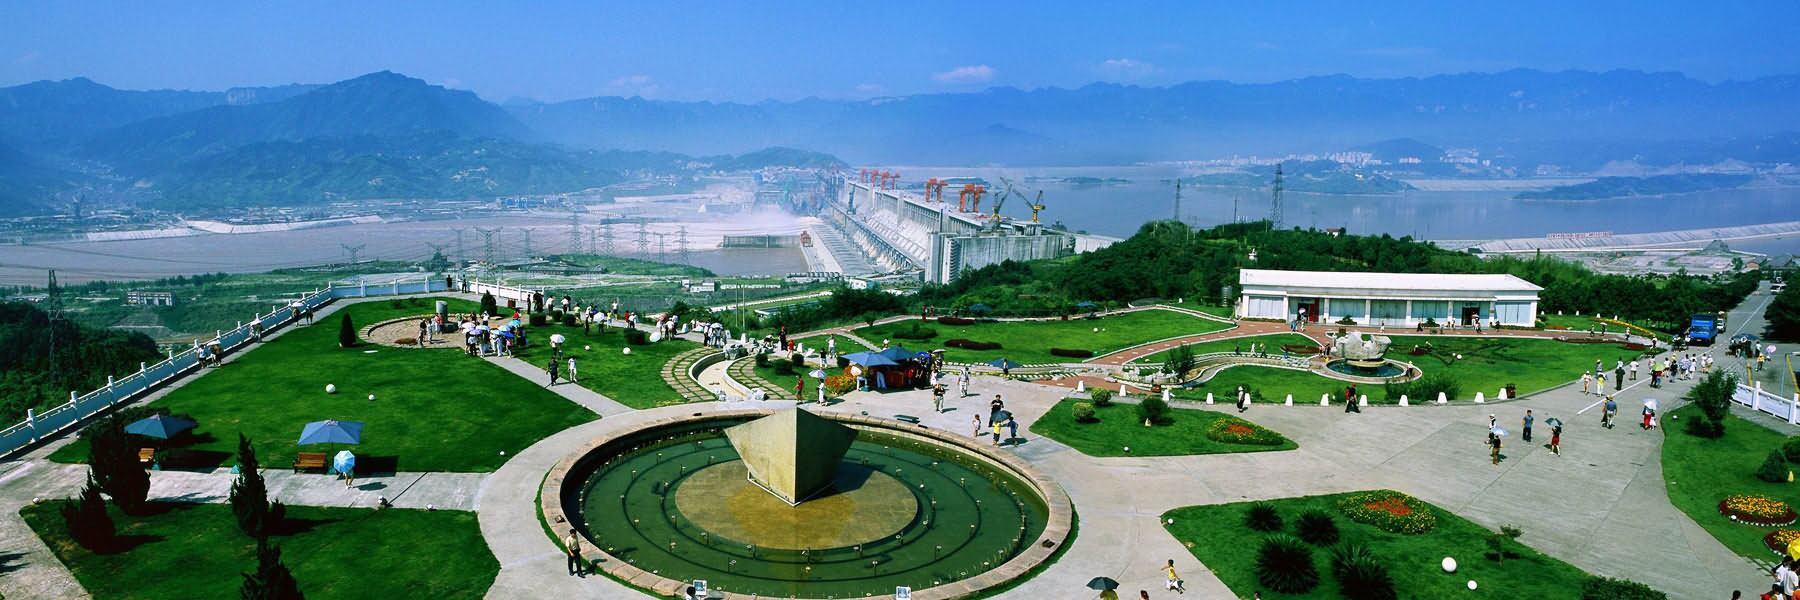 One Day Three Gorges Dam Tour